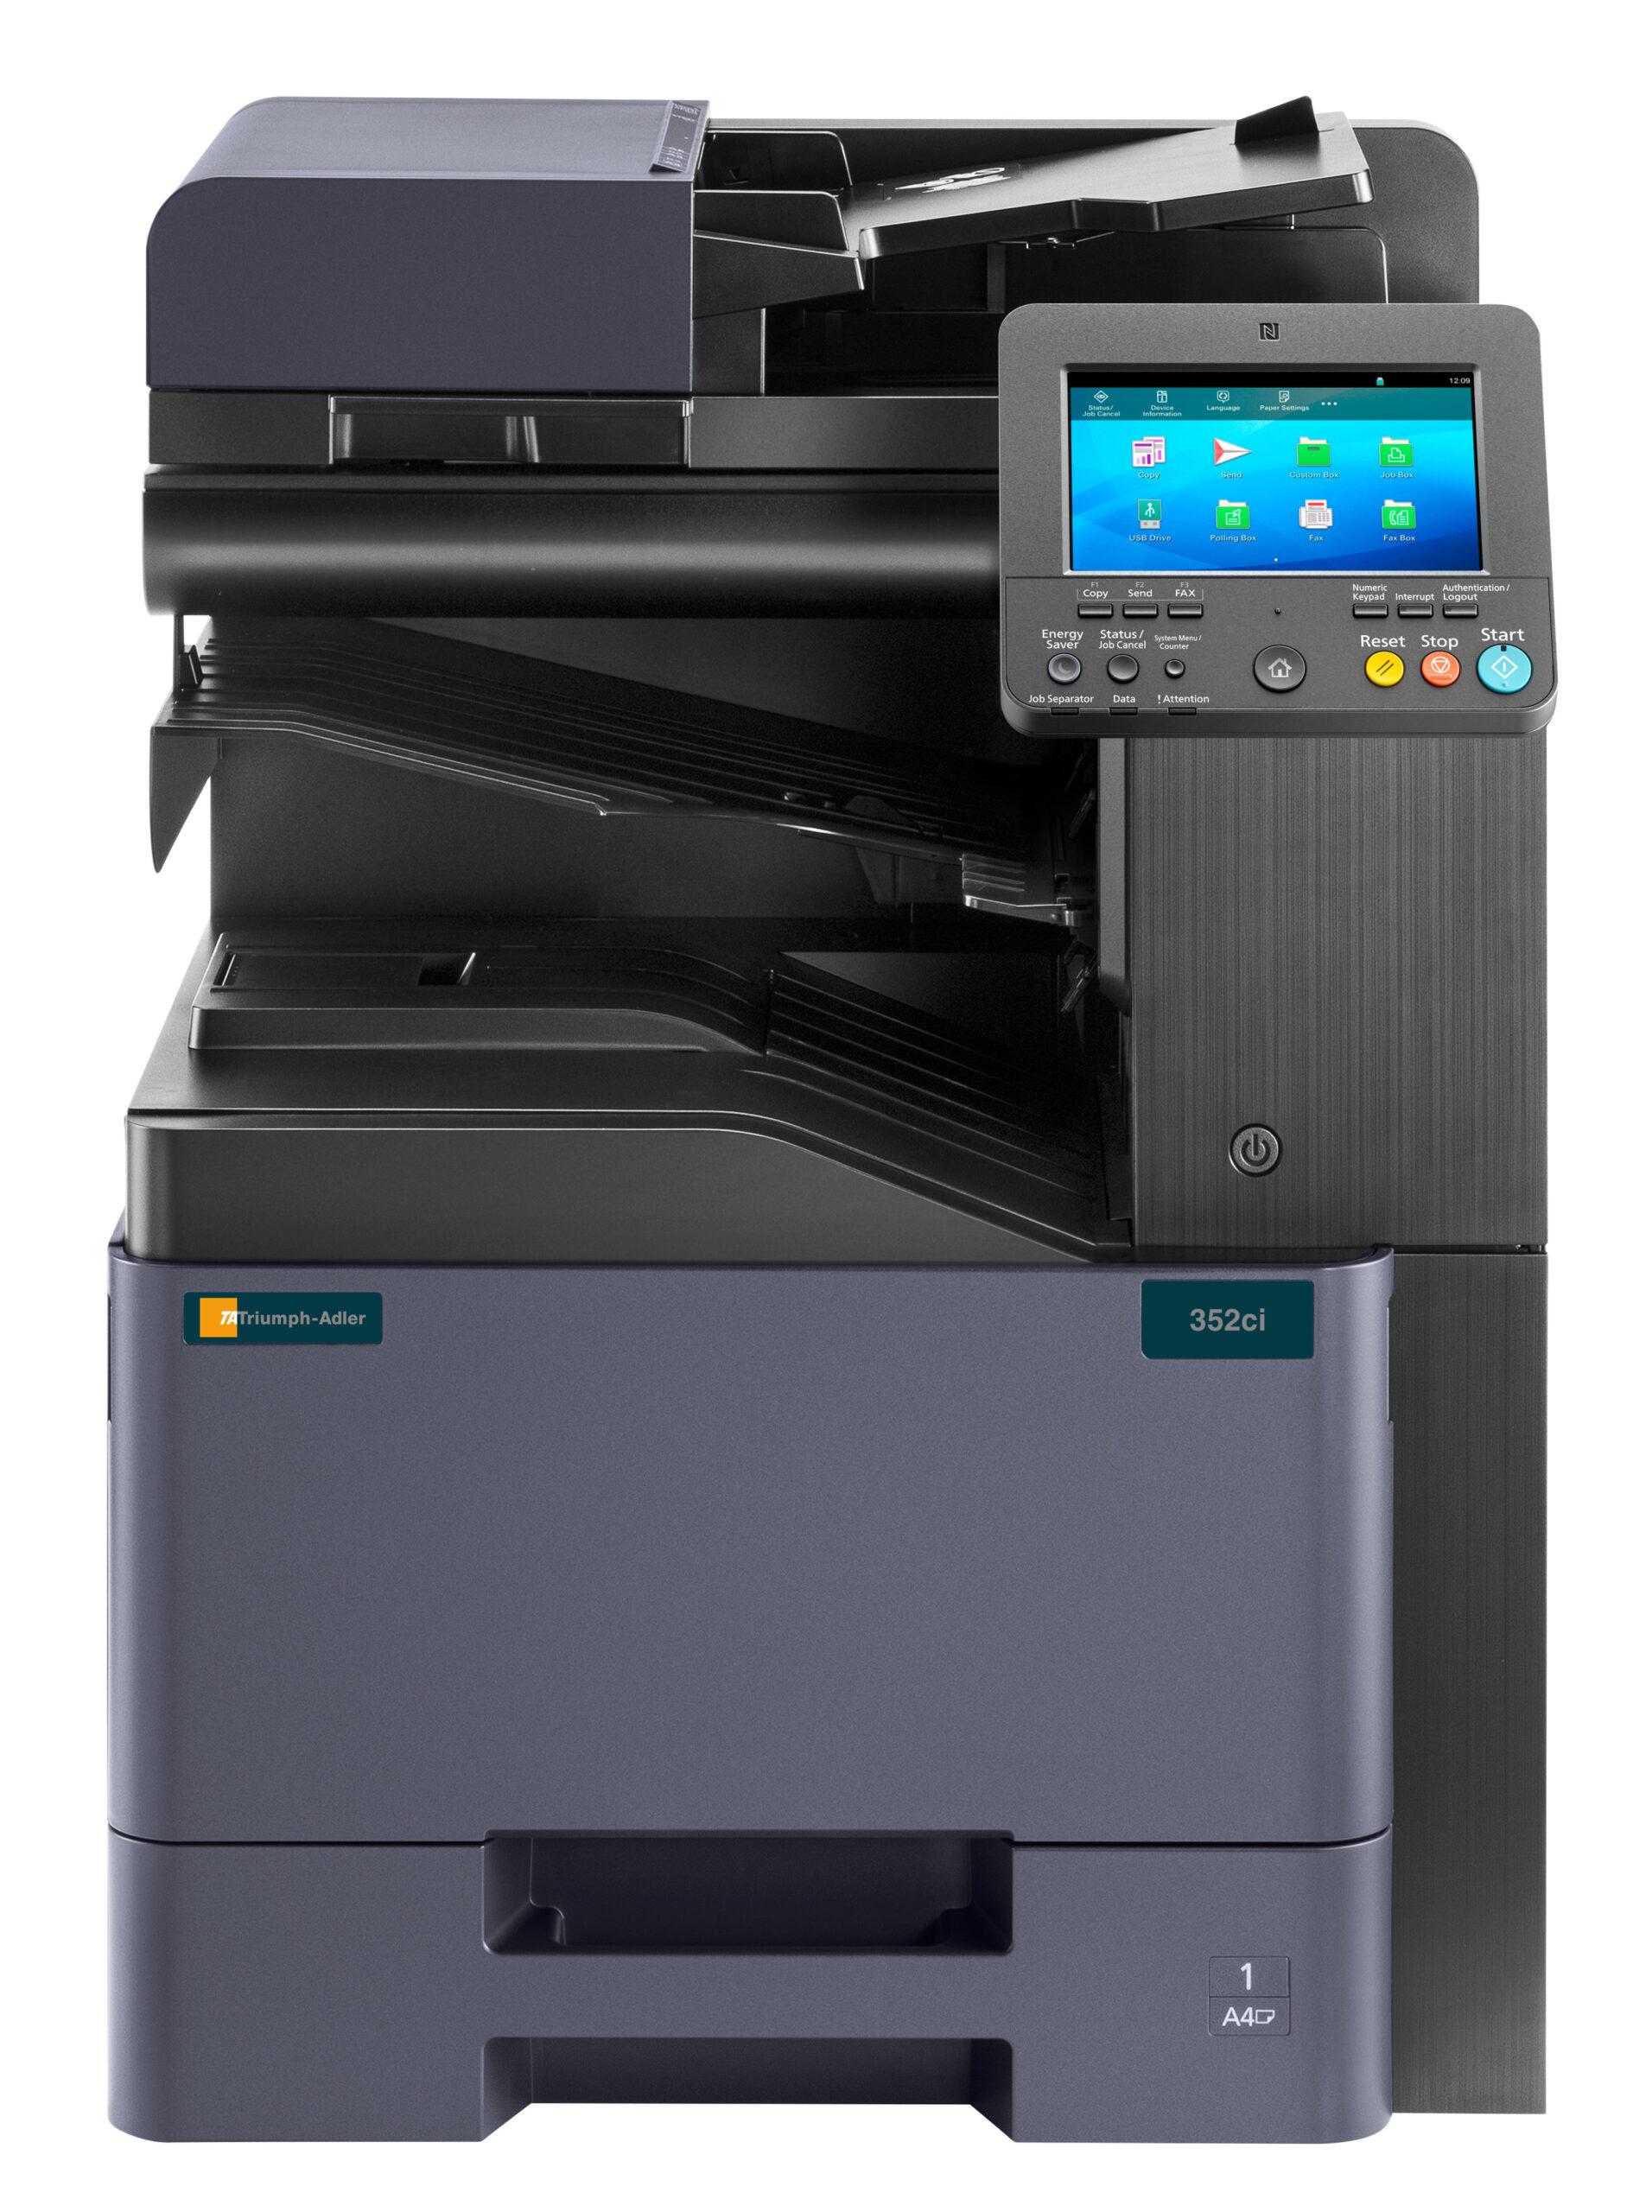 Triumph Adler fotocopiatore 352ci/ 402ci / 502ci MFP